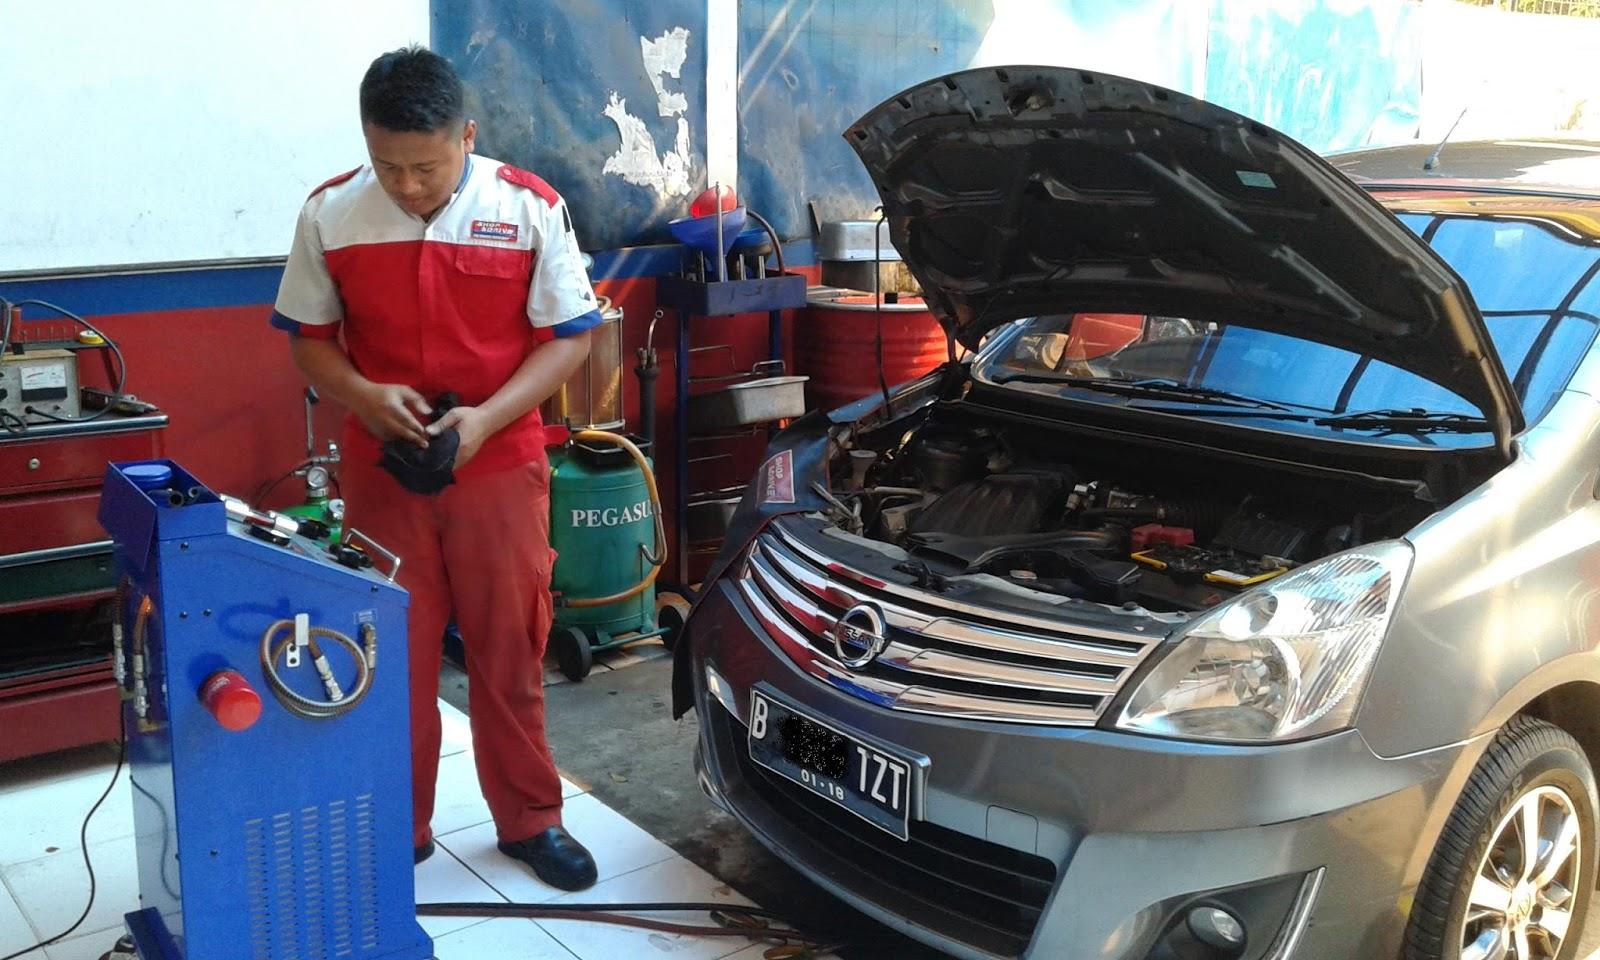 Oli Grand New Avanza Berapa Liter E 1.3 Shop Drive Cijantung Melayani Kuras Transmisi Otomatis Mobil Kenali Jenis Matic Yang Paling Penting Sebelum Melakukan Pelumasan Pada Sistem Adalah Mengenali Digunakan